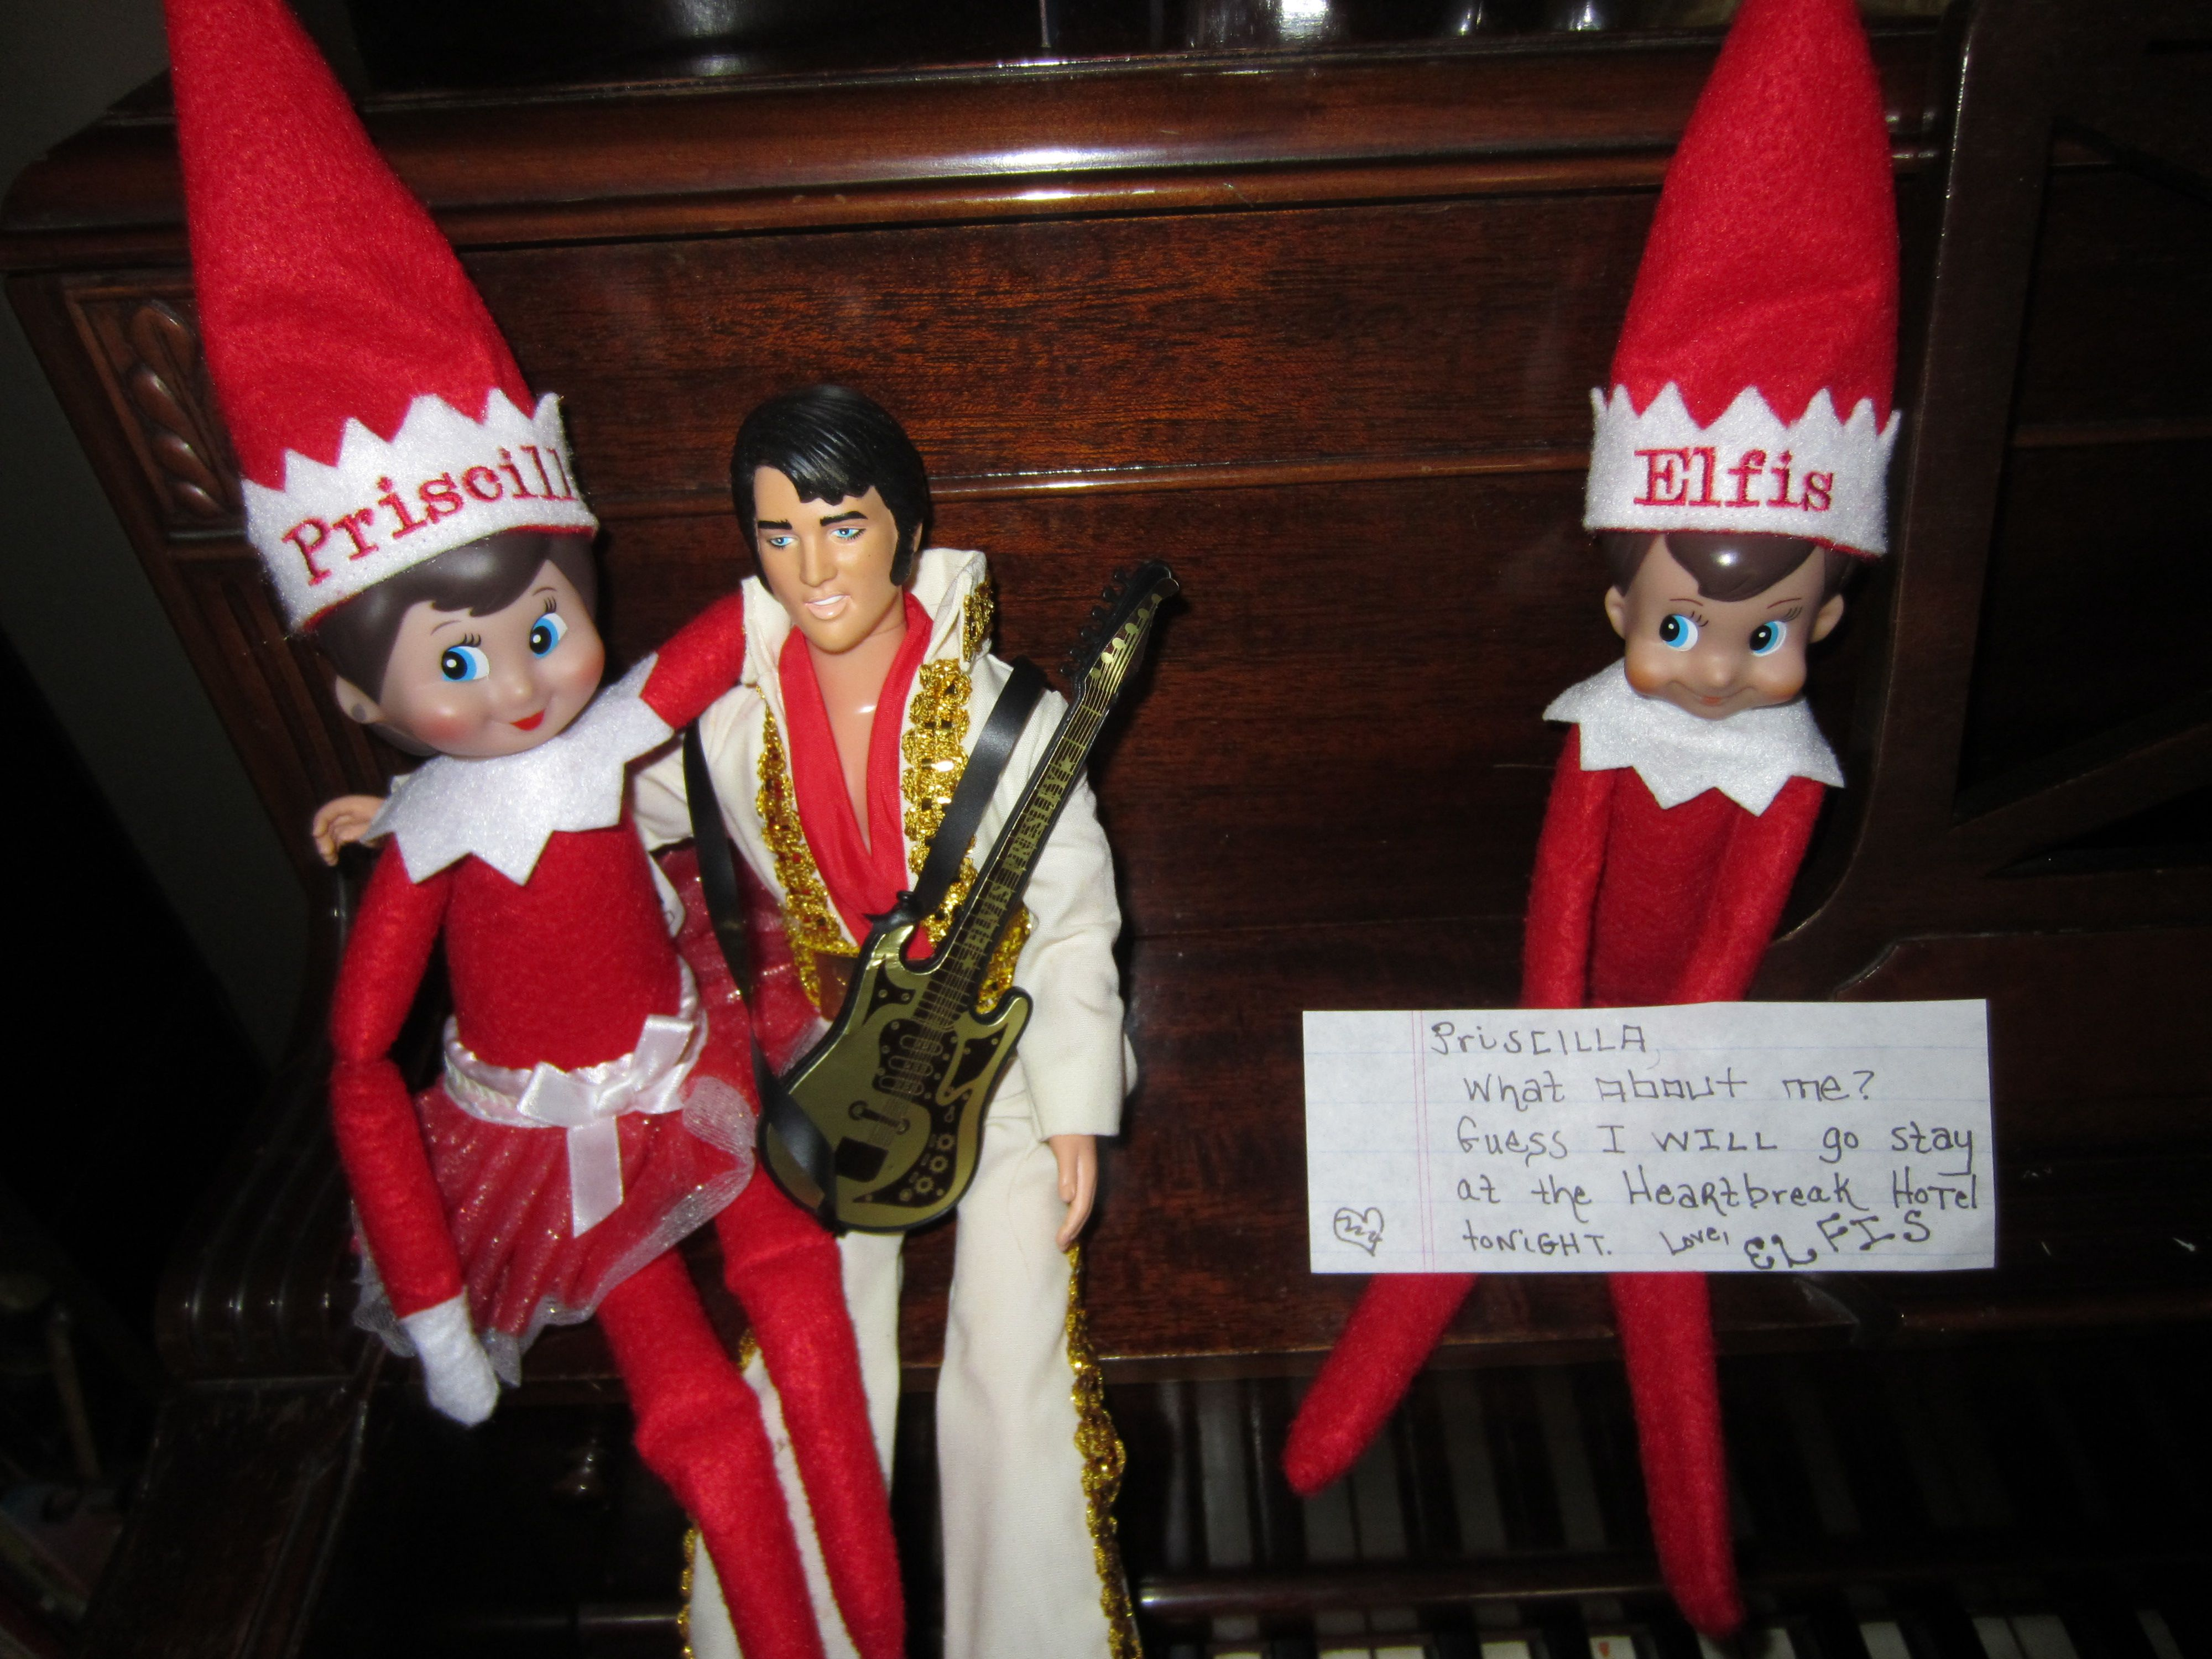 Our Elf on the Shelf Elfis Elvis our girl Elf Priscilla